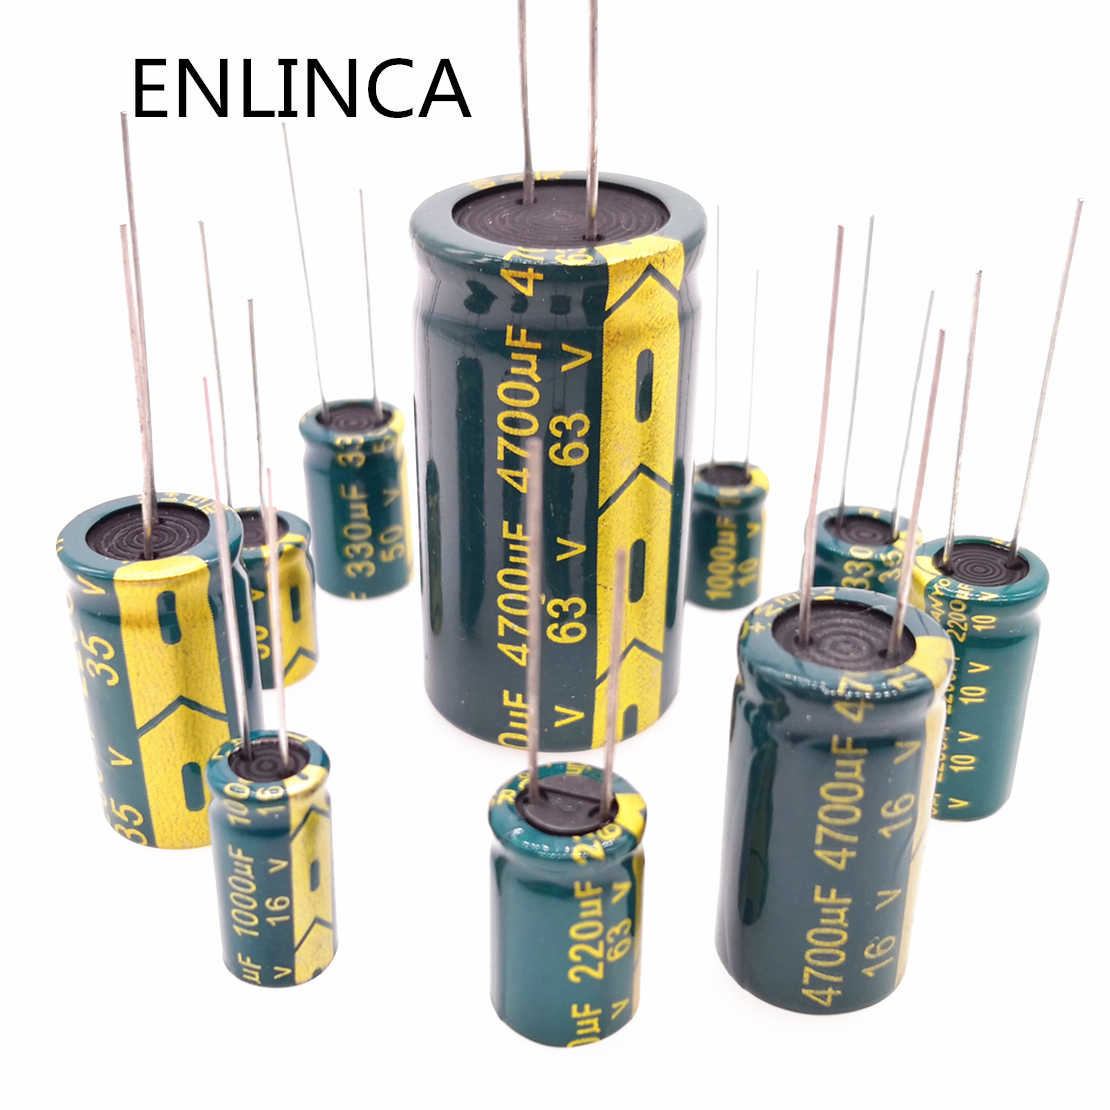 Aluminum Radial Electrolytic Capacitor Low ESR Green 2.2uF-470uF 10V-400V 3000H